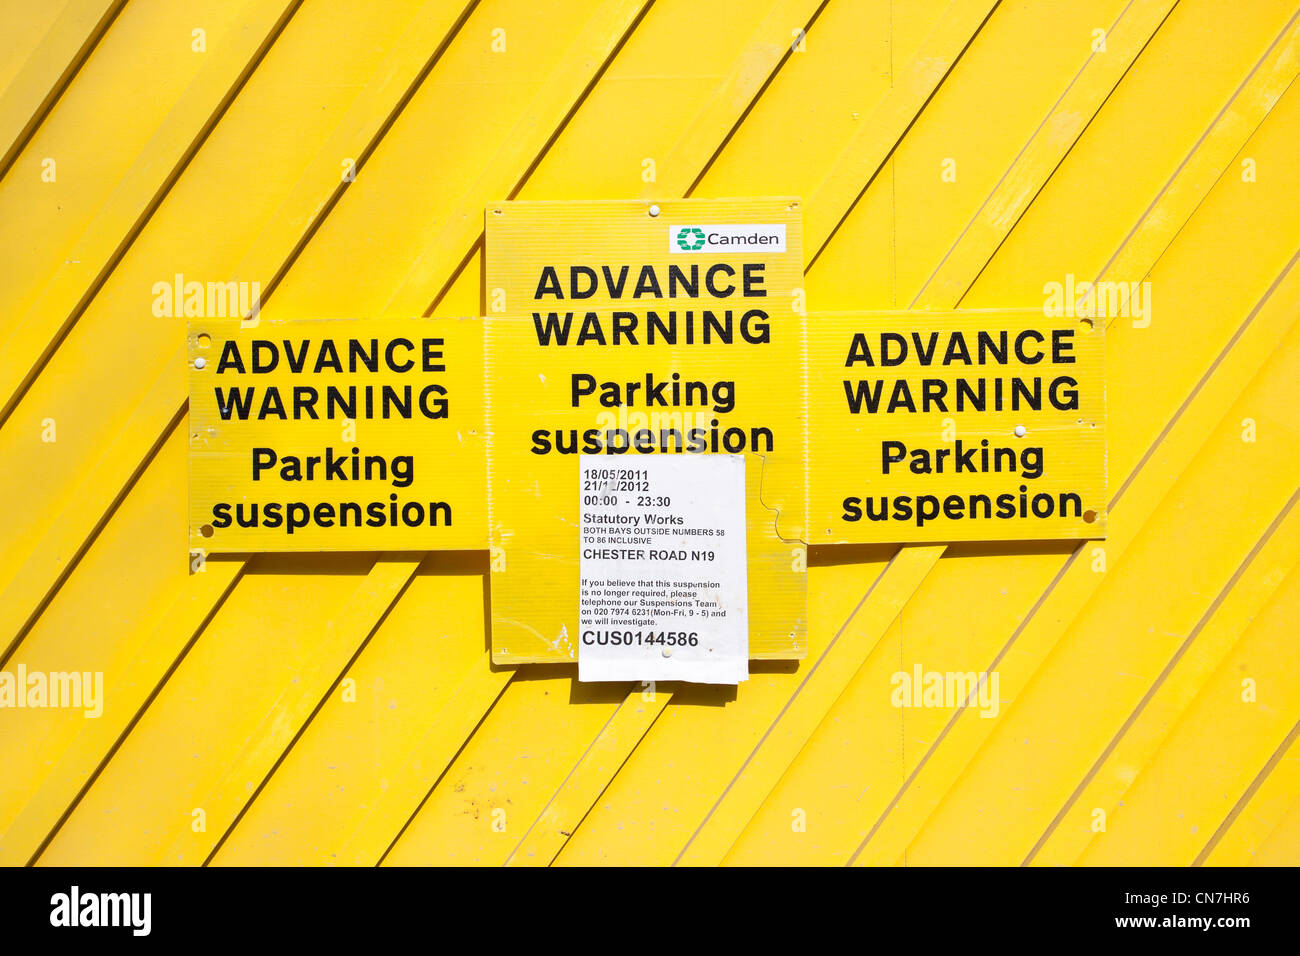 Advance warning Parking suspension - Stock Image